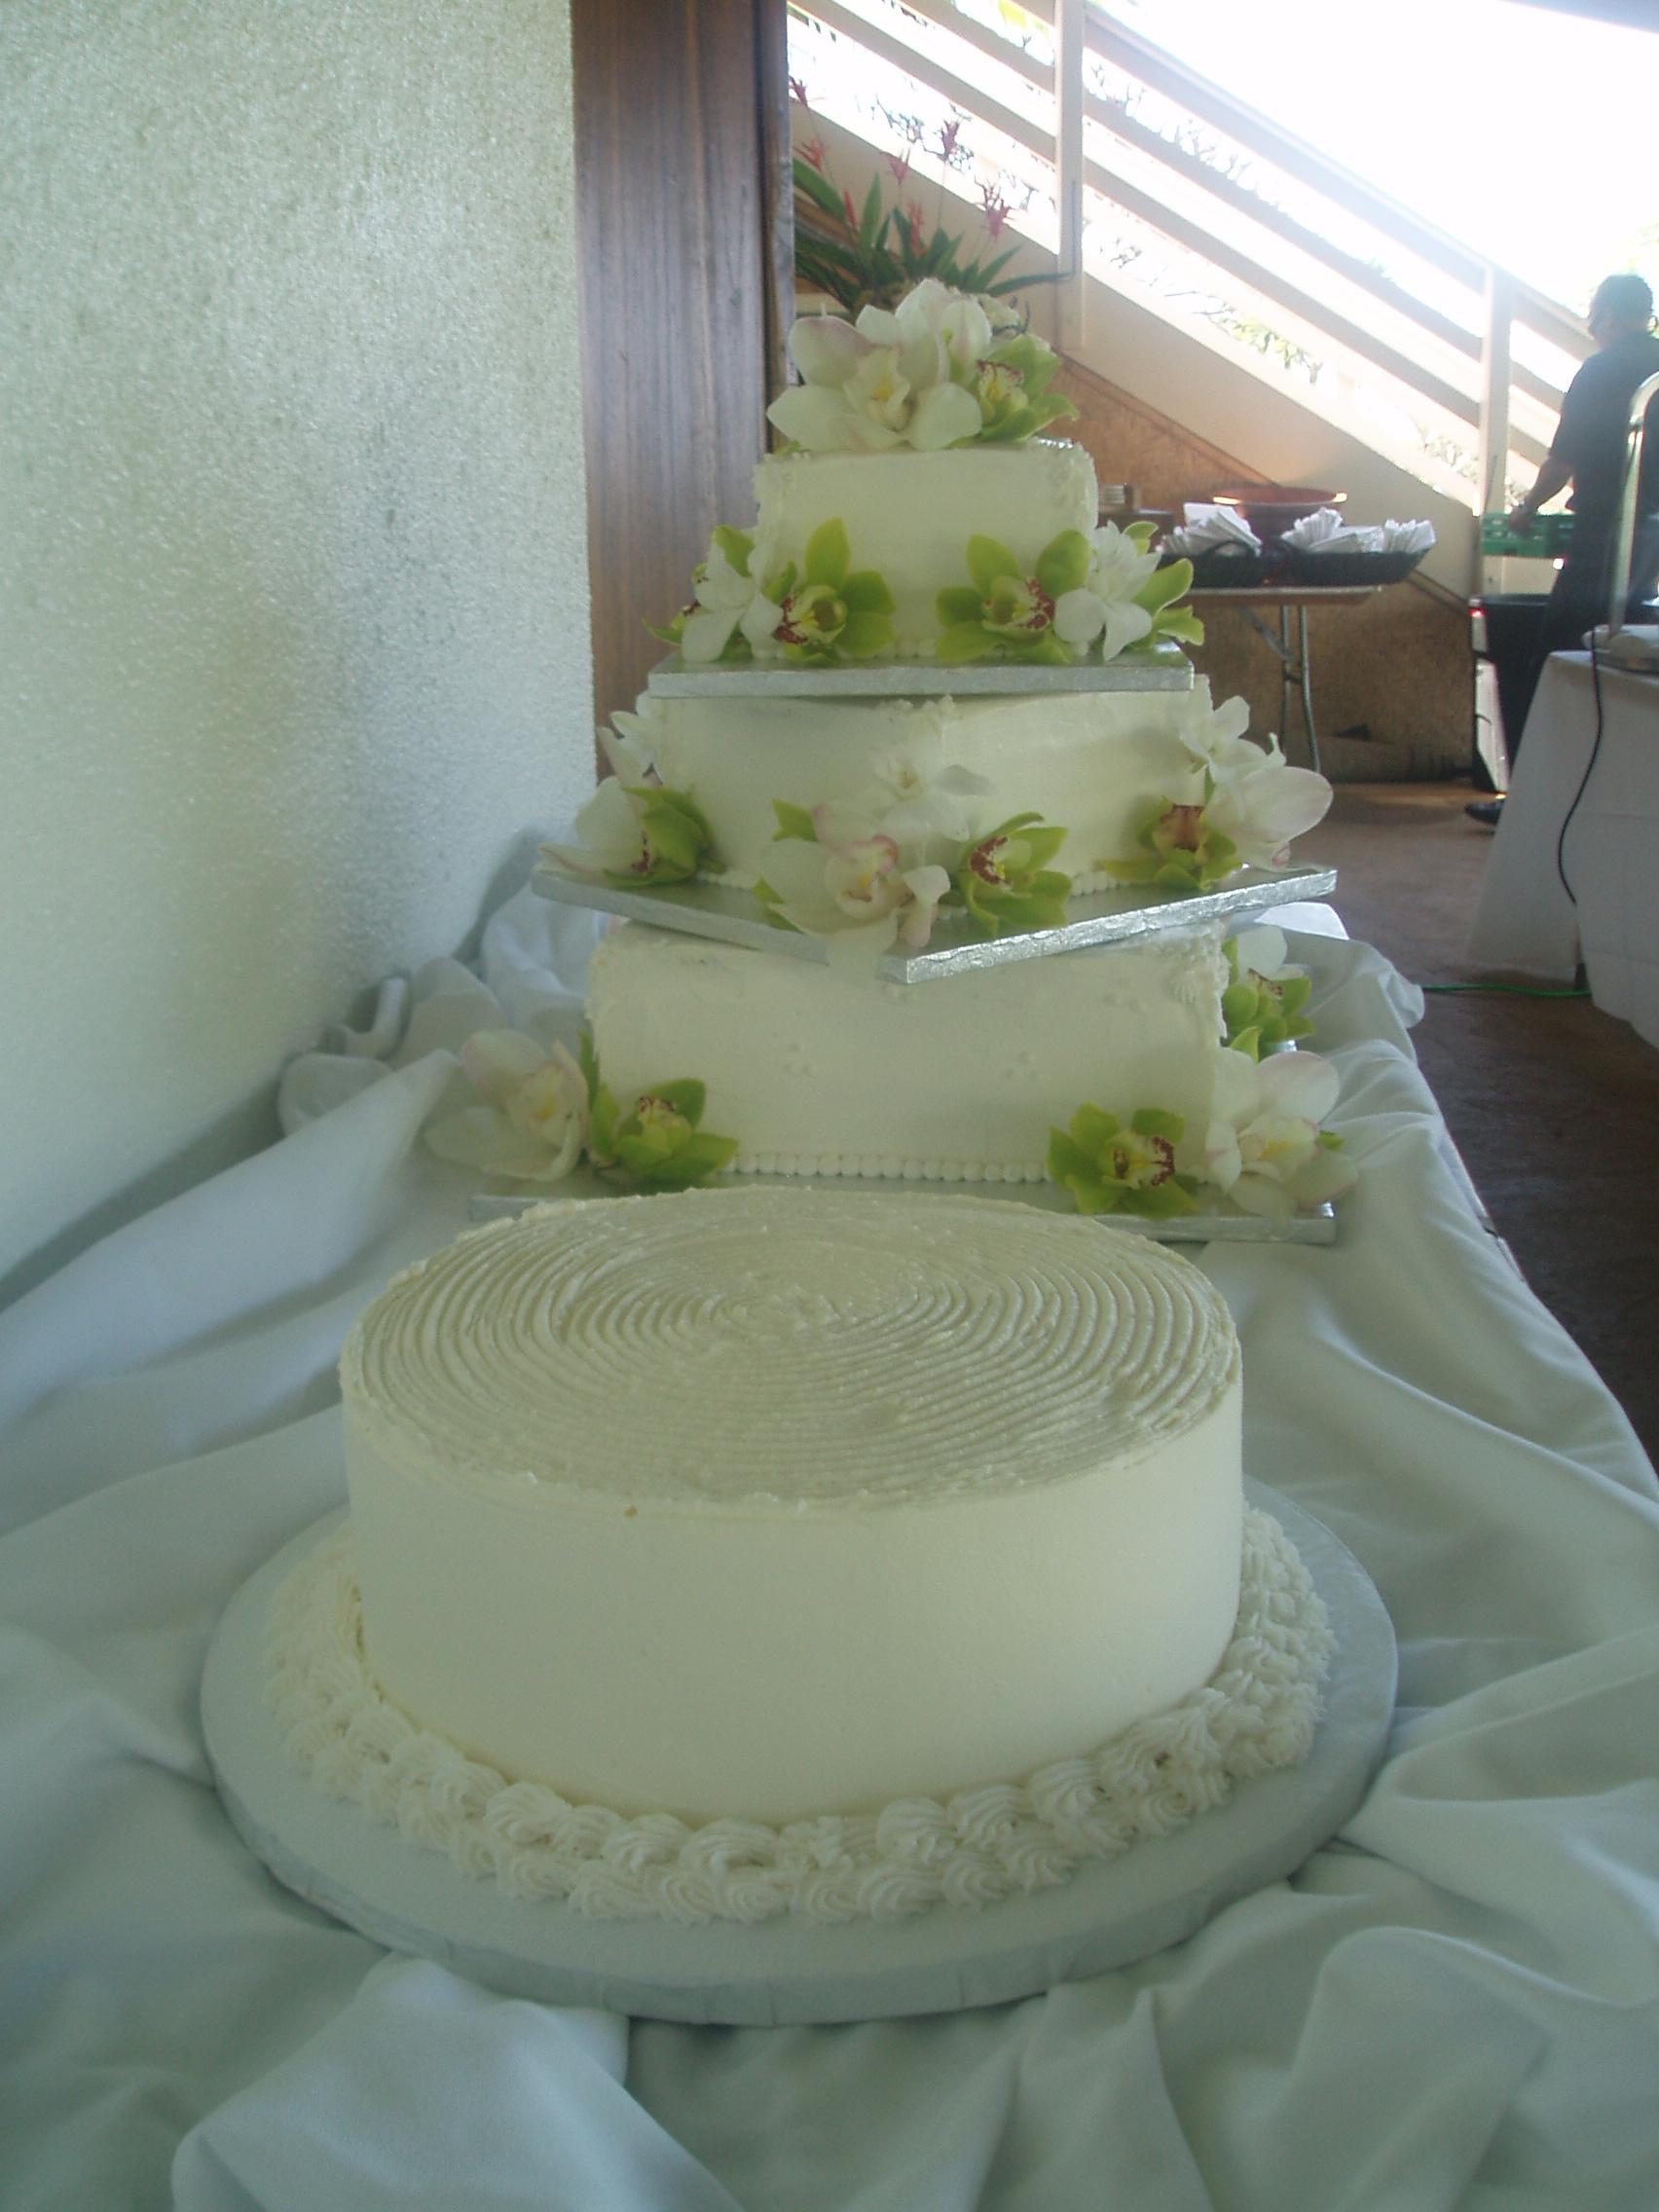 Cakes 013 (3).JPG